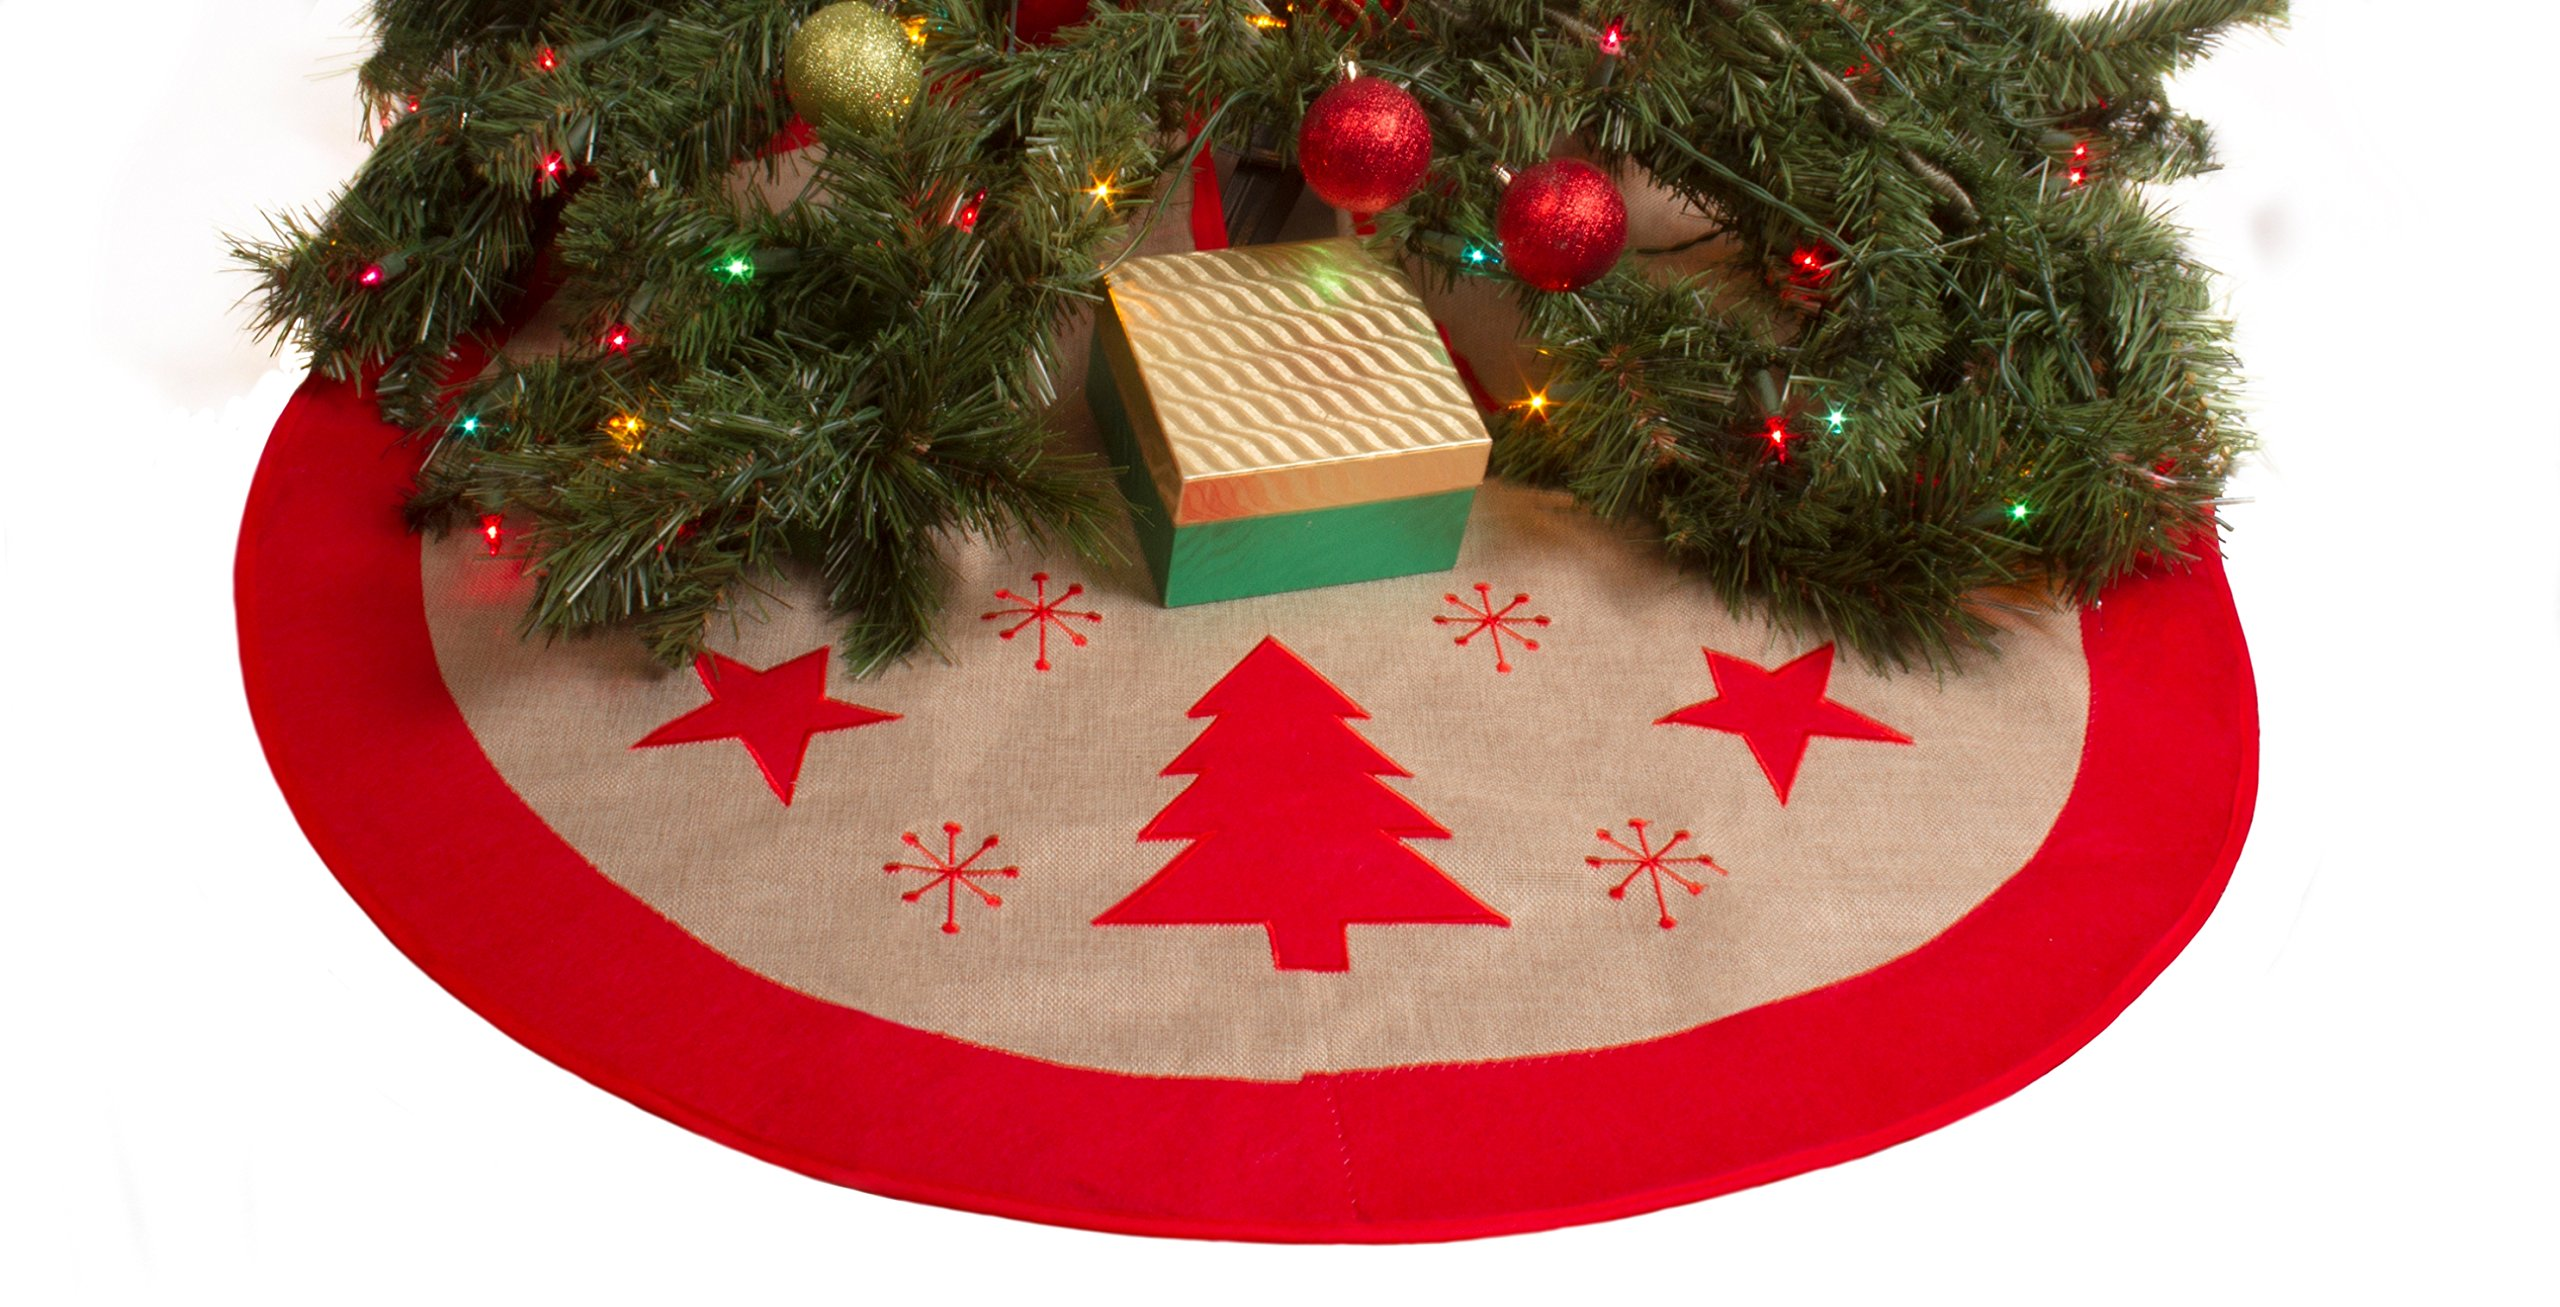 buy 36 burlap christmas tree skirt xmas tree skirt red border burlap tree skirt stars trees in cheap price on malibabacom - Burlap Christmas Tree Skirt